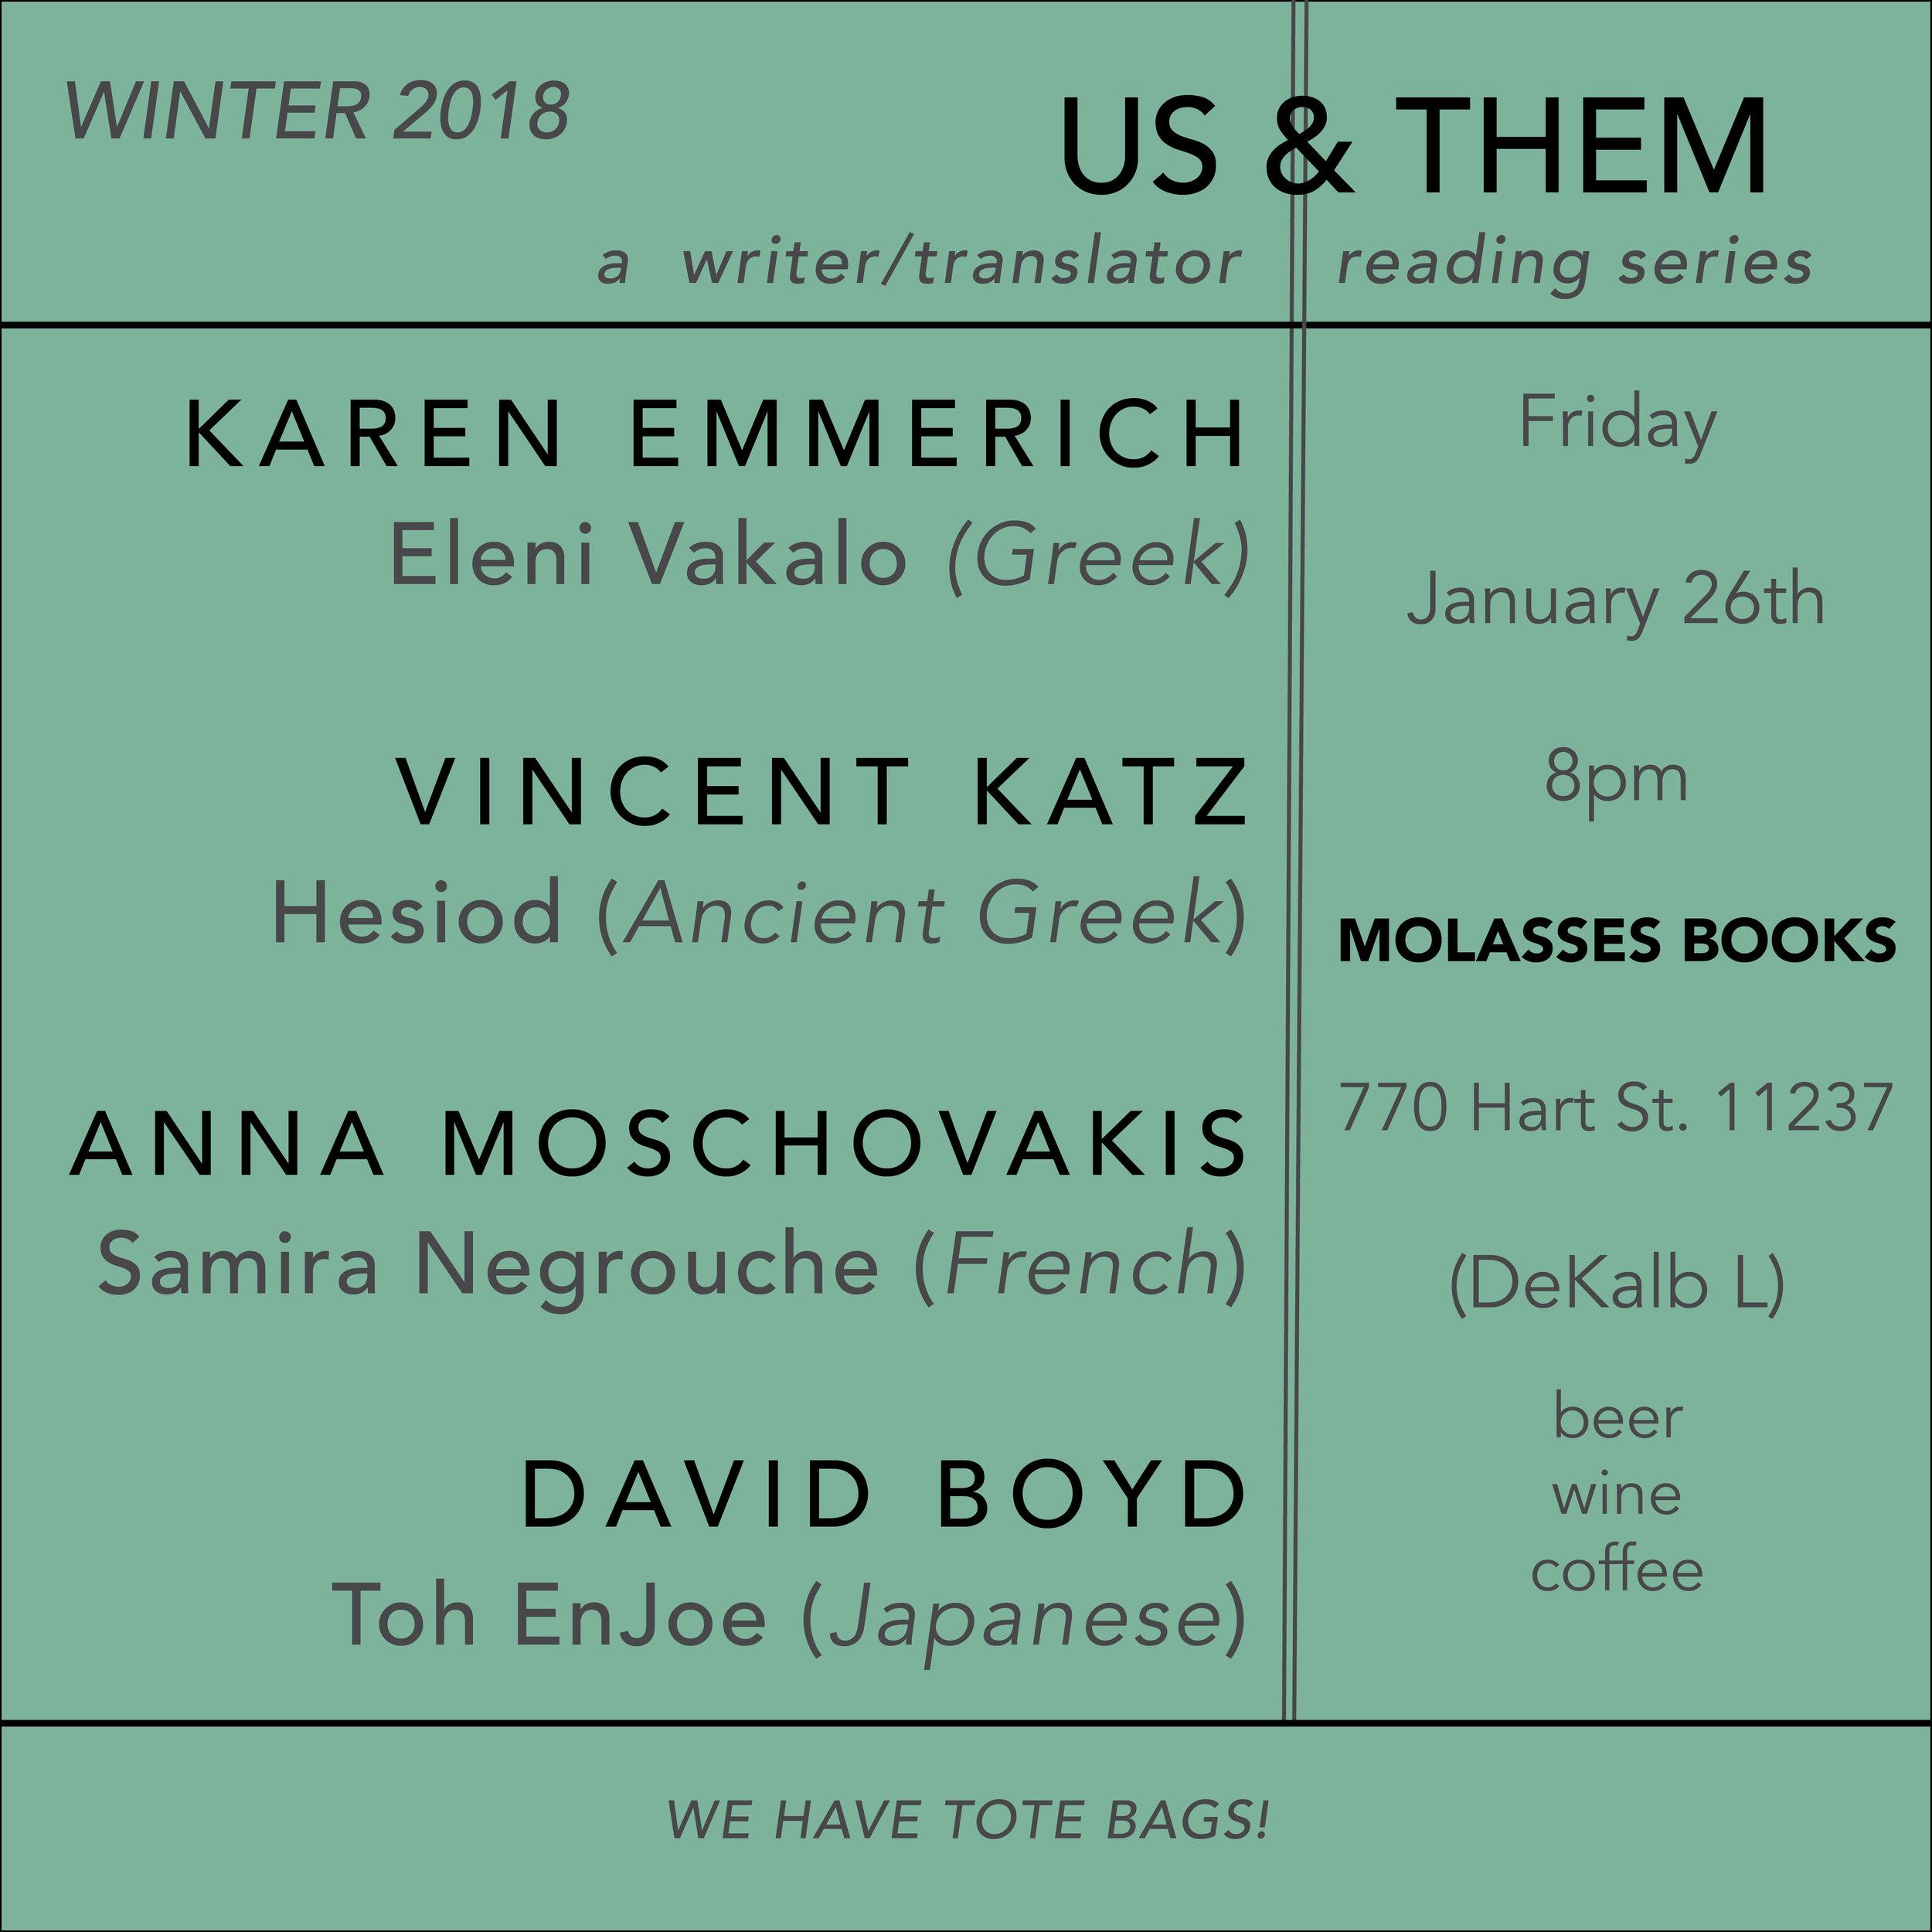 2018_Winter_Us&Them flyer_r2.jpg